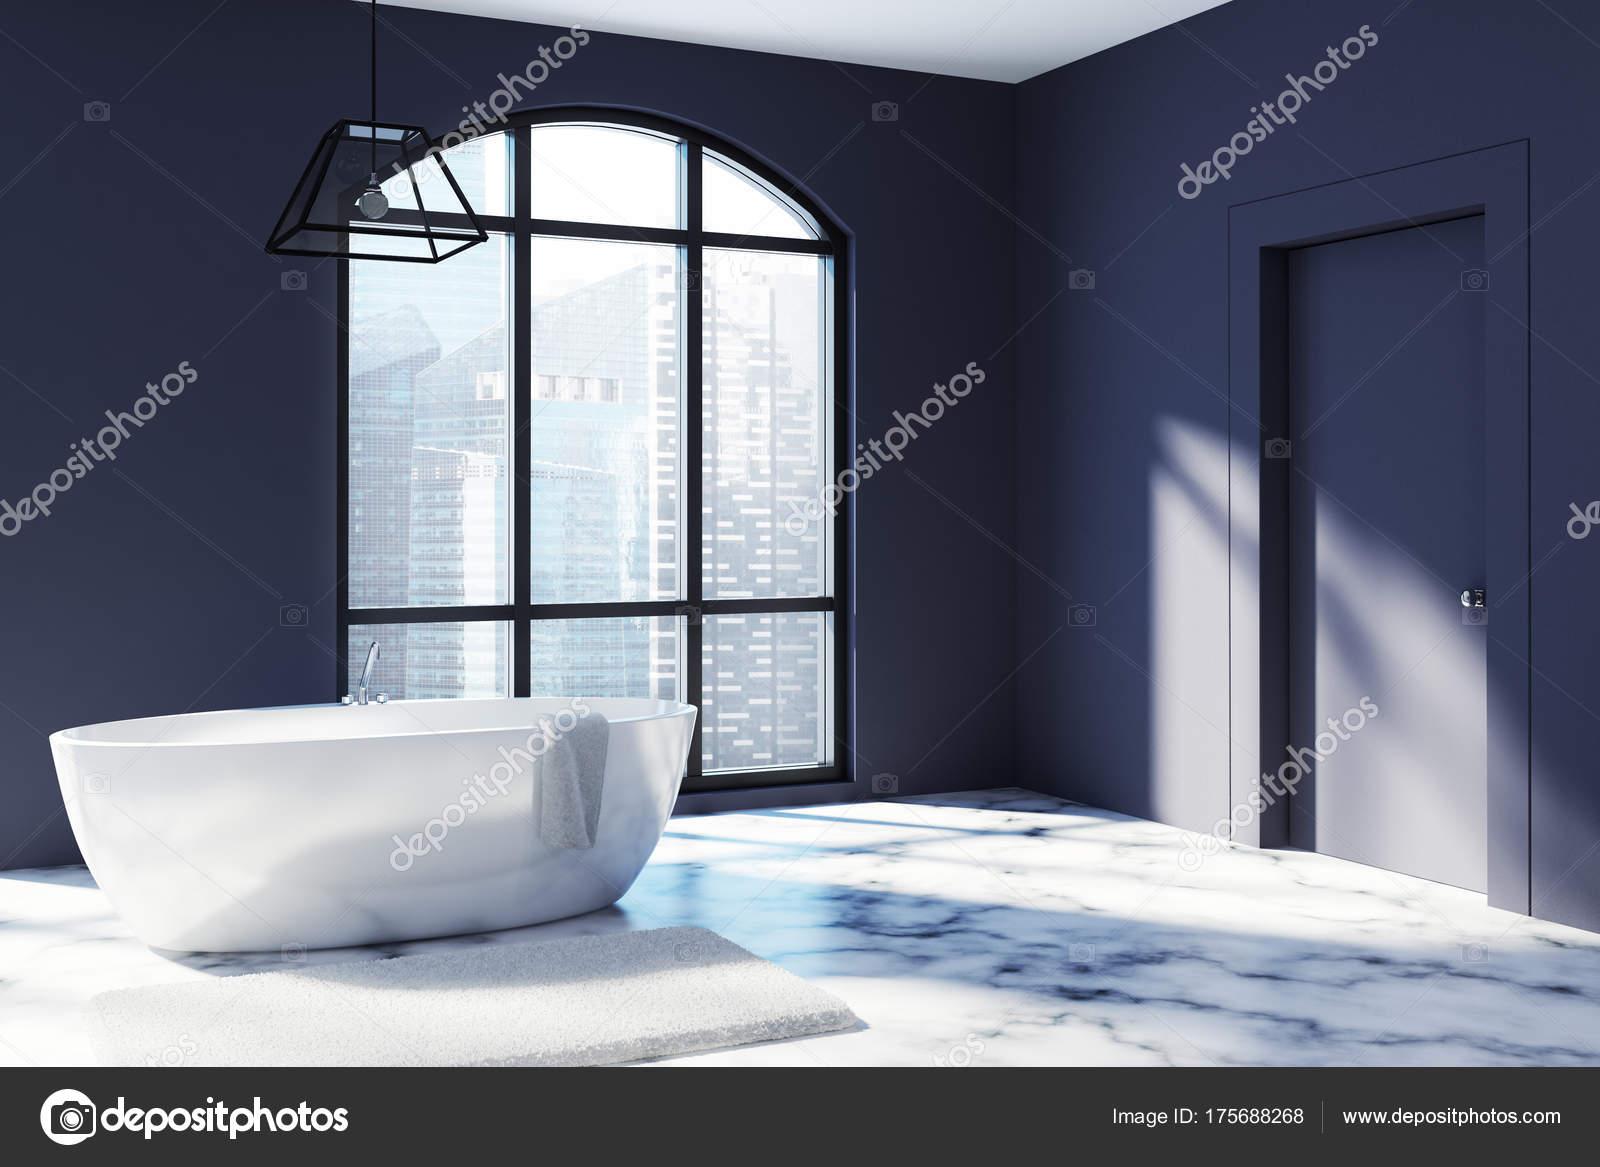 Marmeren Badkamer Vloer : Zwarte badkamer hoek marmeren vloer u stockfoto denisismagilov